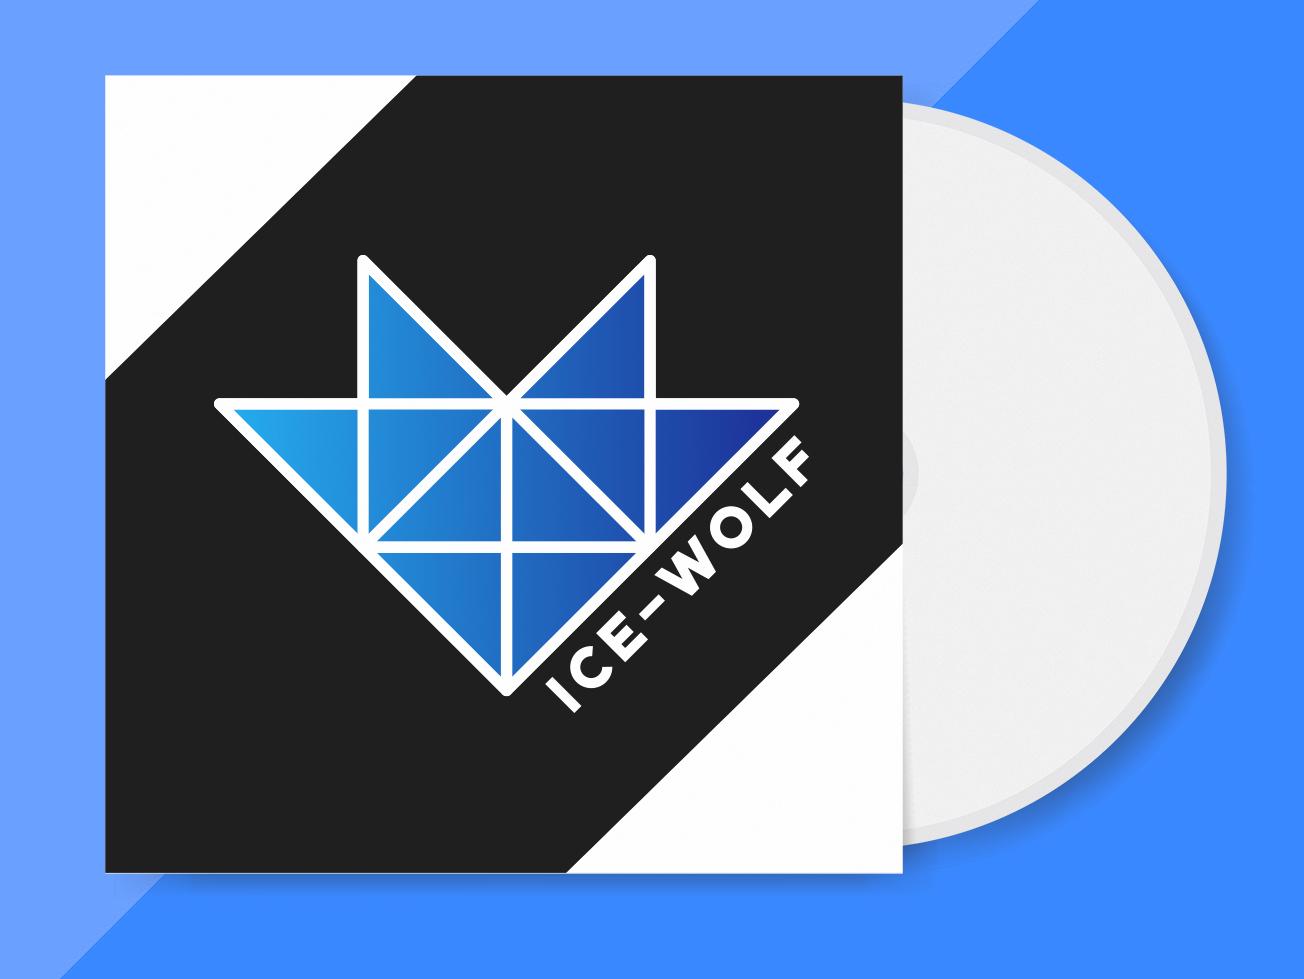 Band Logo Ice Wolf typography logoinspiration logodesigner logo design logo cd bands wolf branding modern minimal graphic  design graphic artist cd cover cd design band designer design creativity creative